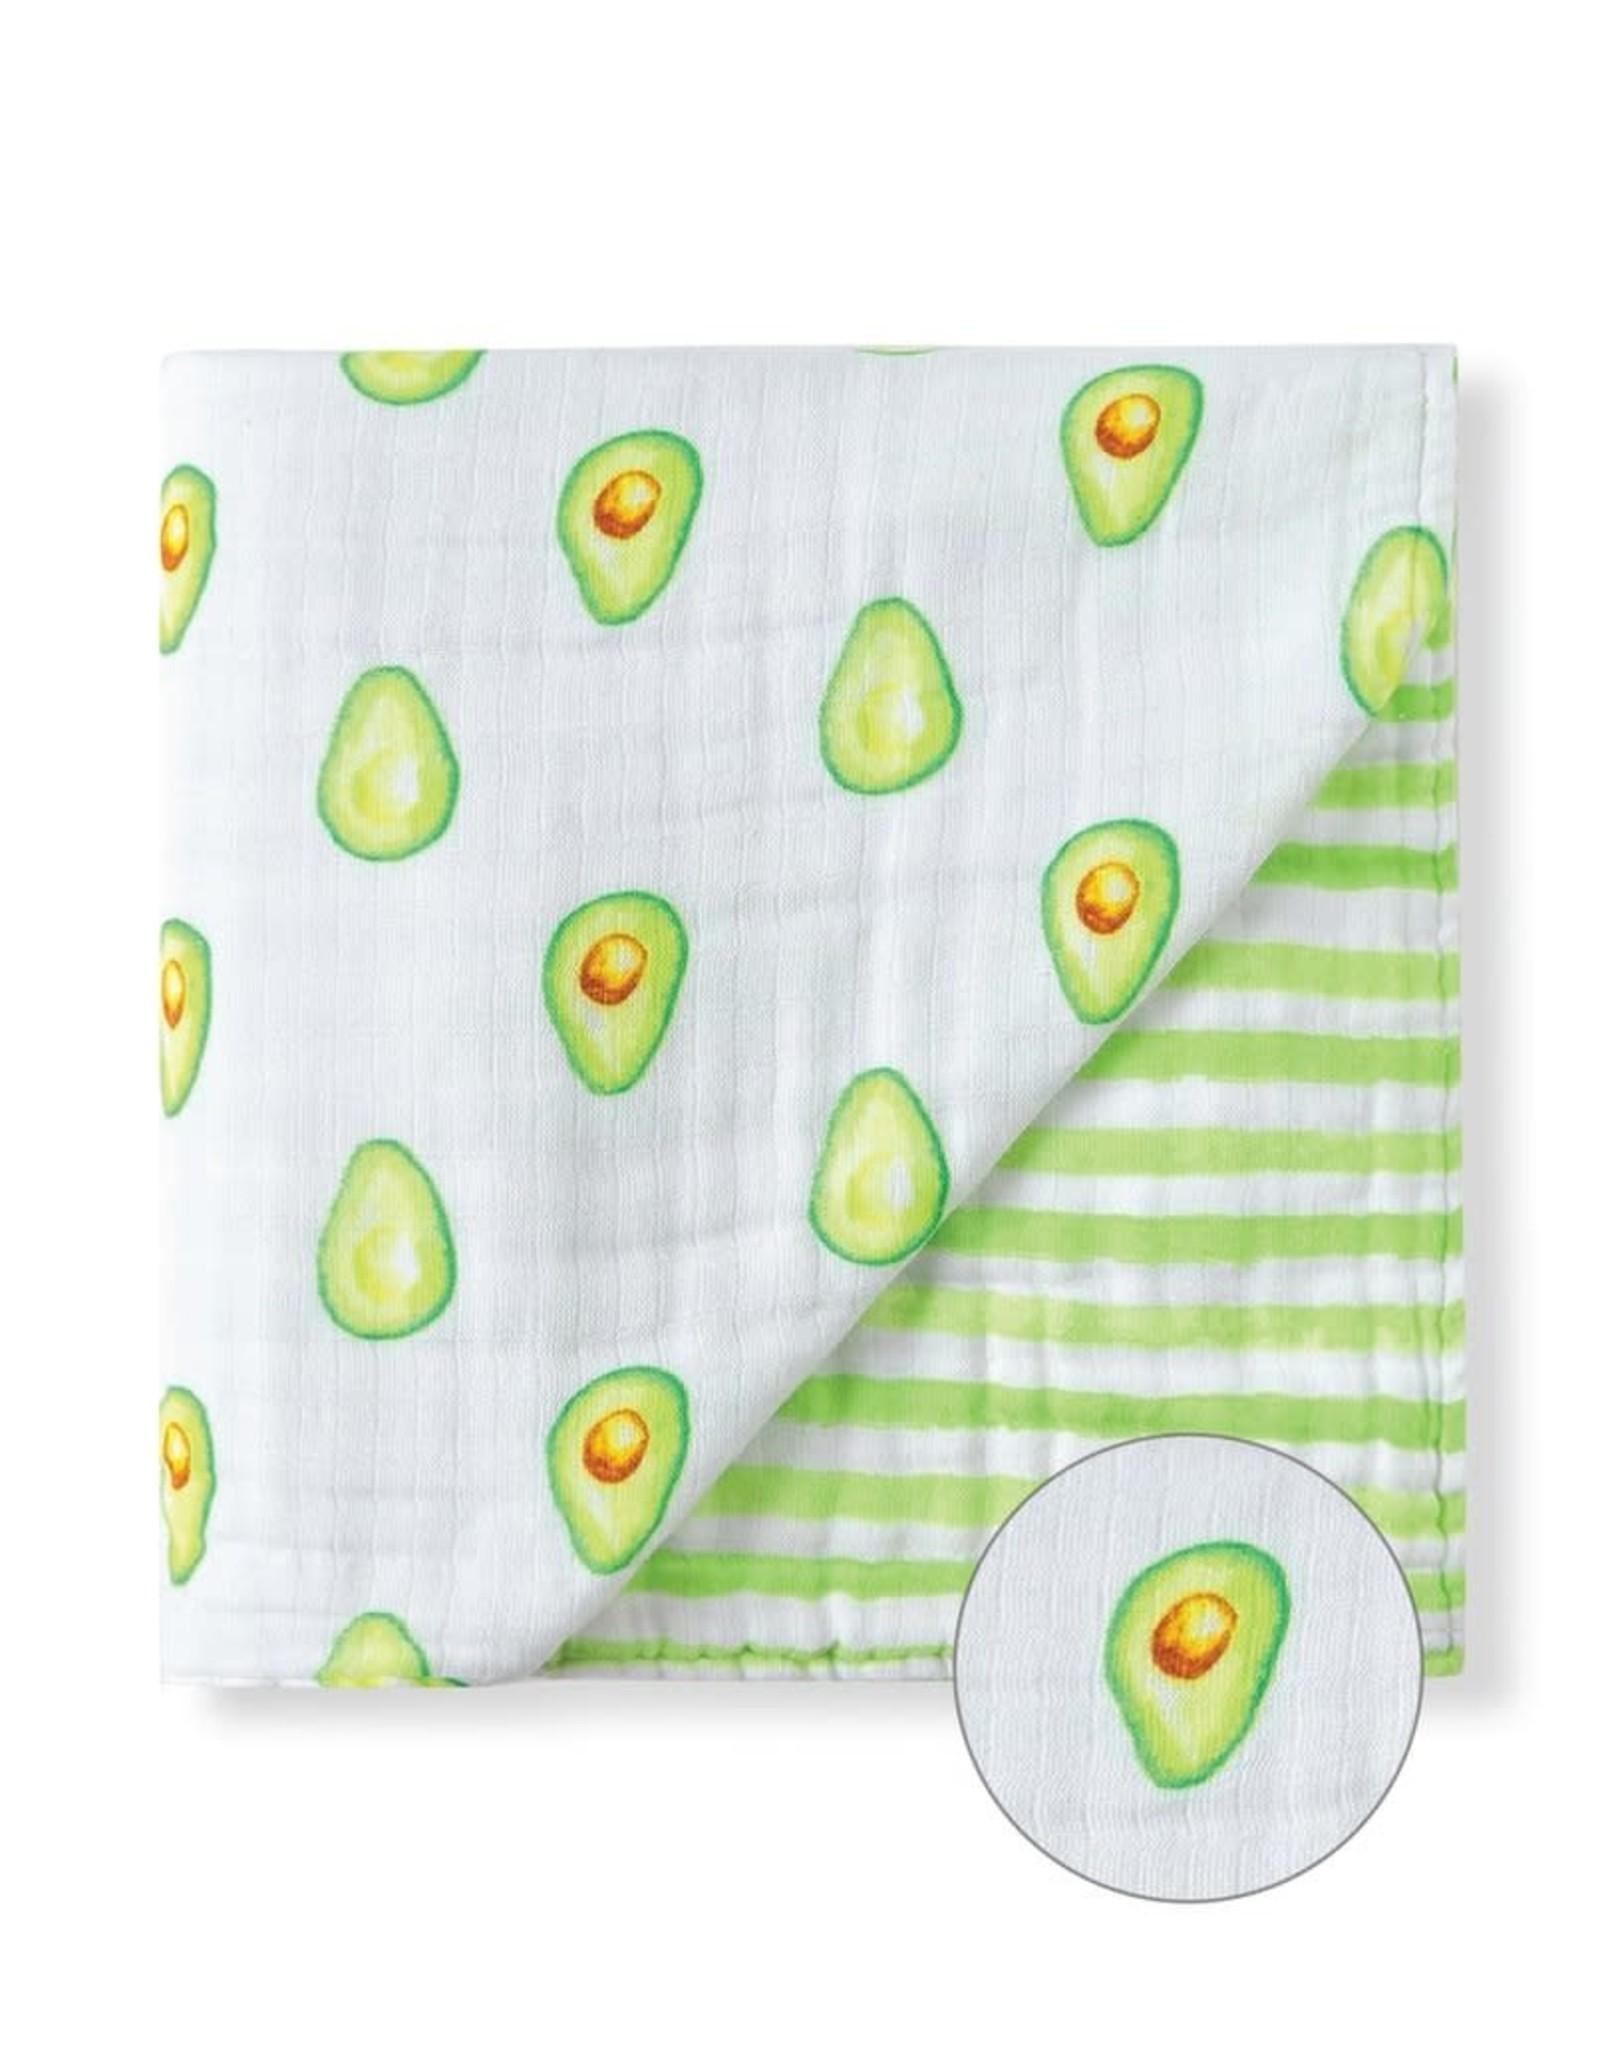 Malabar Baby Organic Baby Blanket (avocado) | Malabar Baby